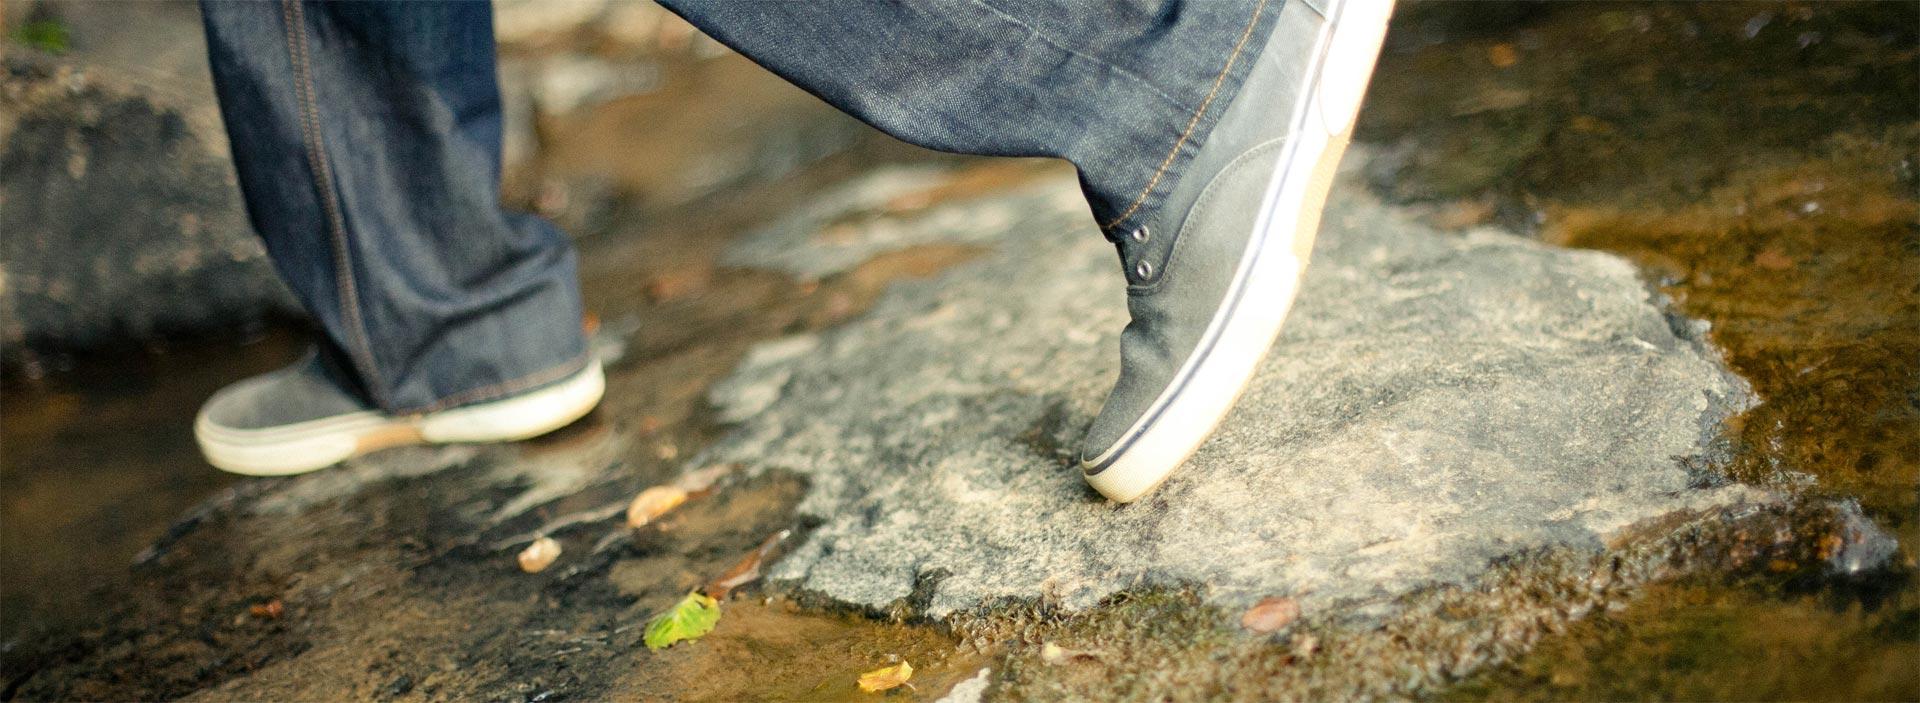 Shoes walking through puddle